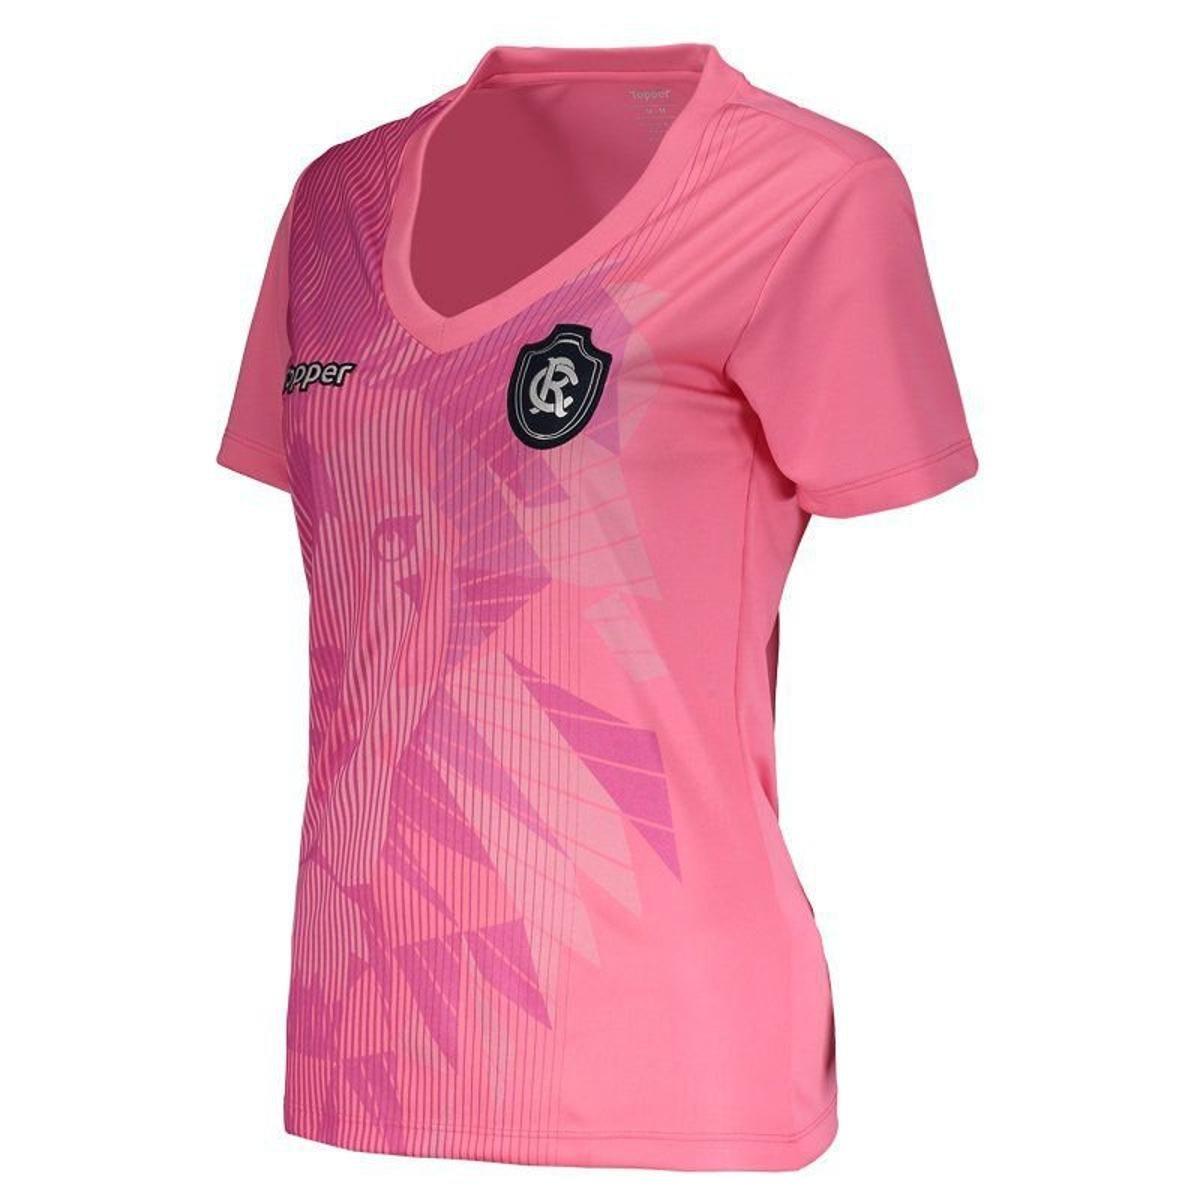 Camisa Topper Remo 2018 Outubro Rosa Feminina - Rosa - Compre Agora ... b8234fa3b3ce7